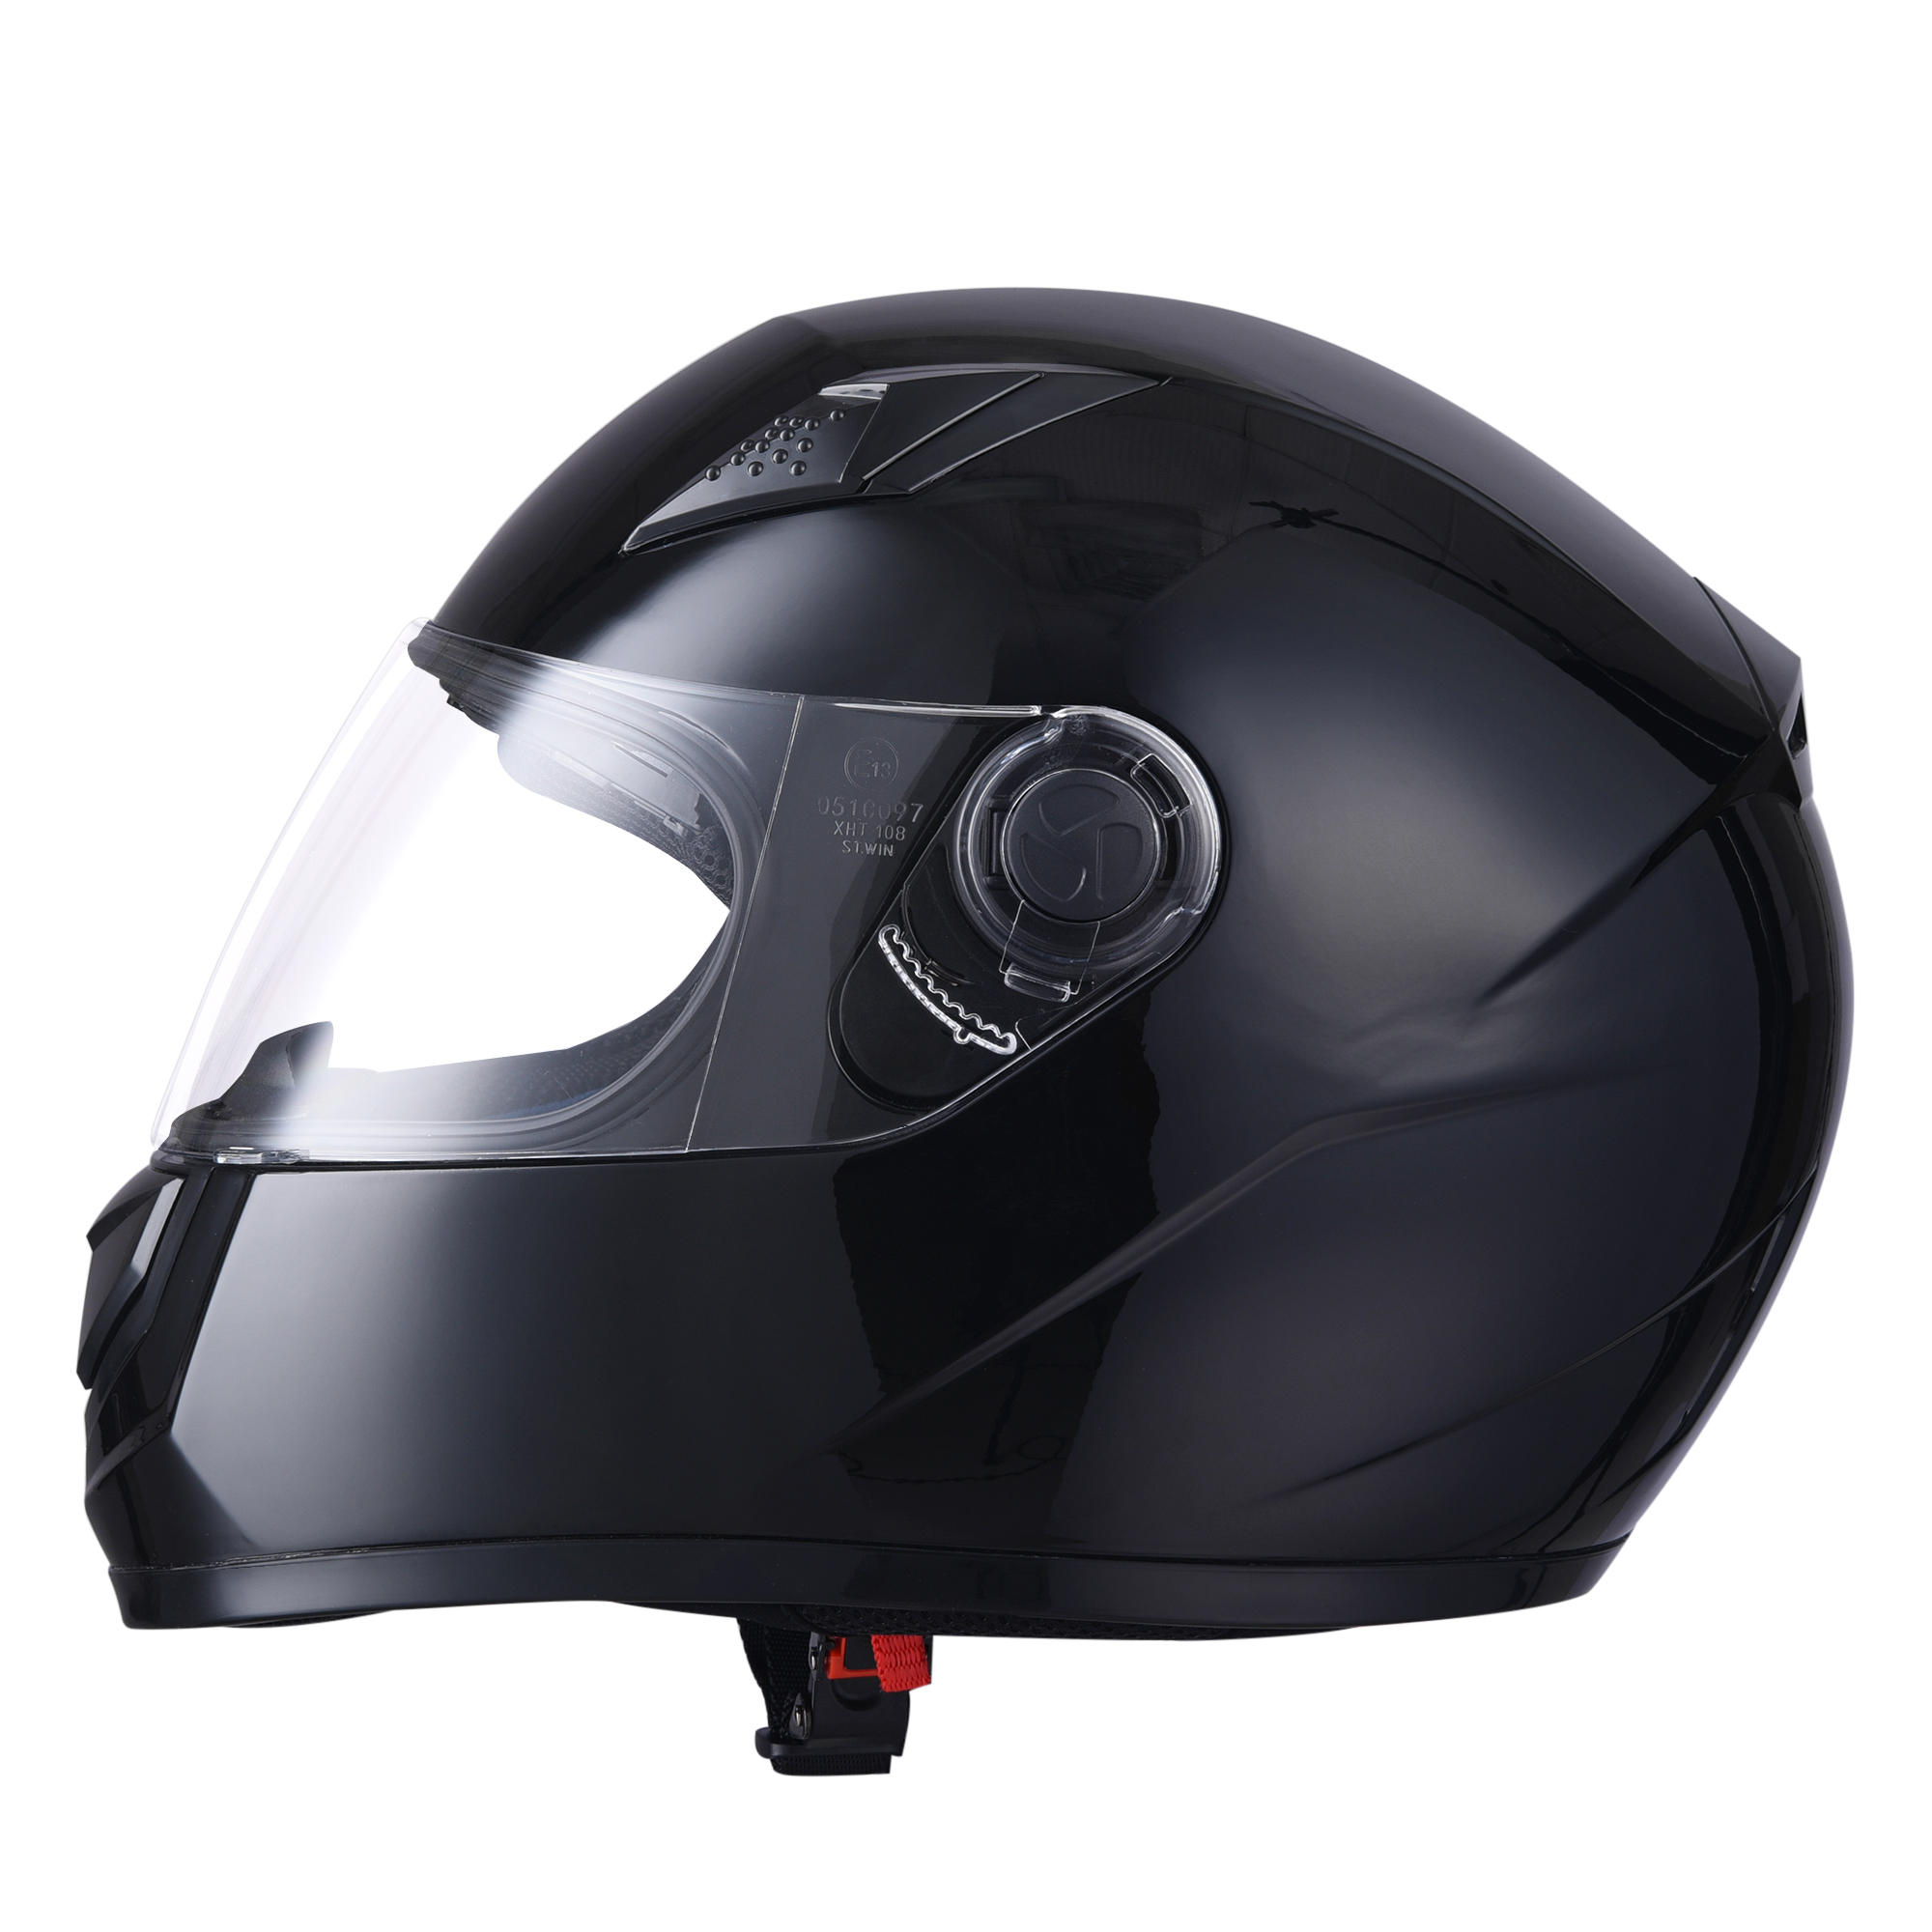 miniature 16 - AHR K12 Full Face Motorcycle Helmet DOT Air Vents Clear Visor Racing S M L XL